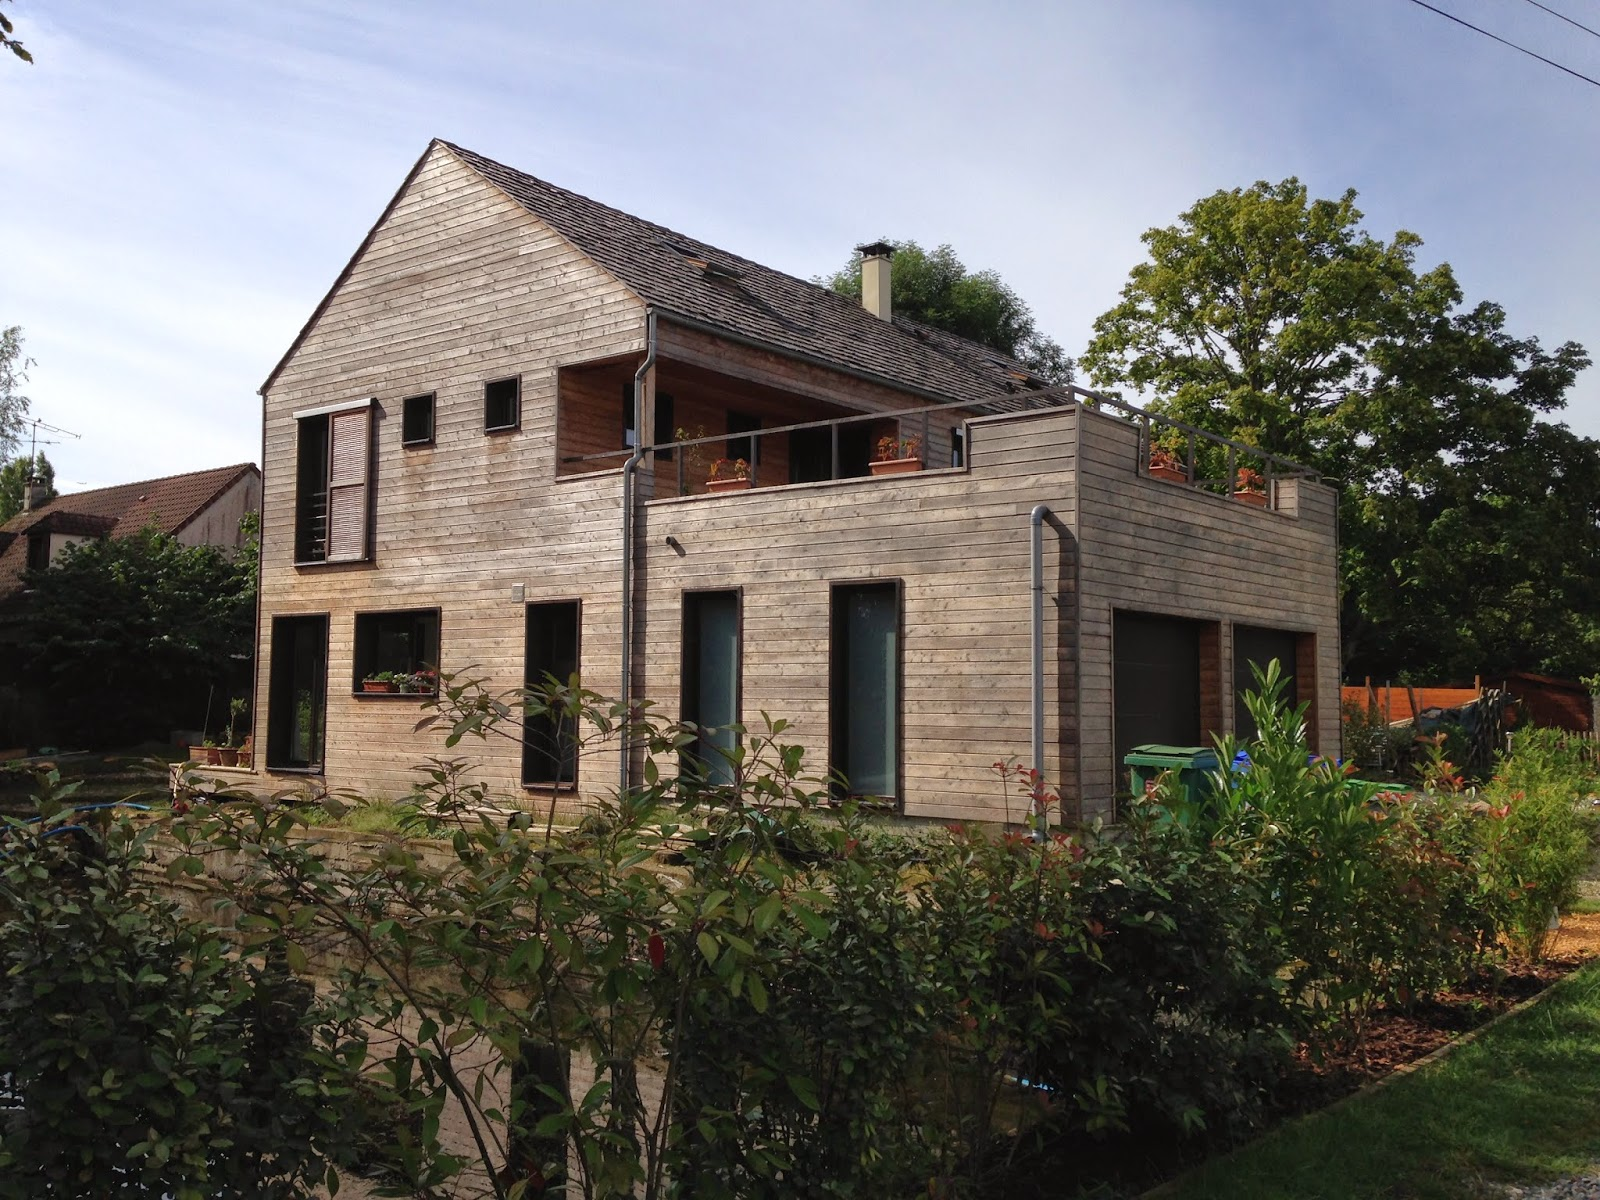 Maison bois cernay en bardage red cedar architecte for Architecte maison bois